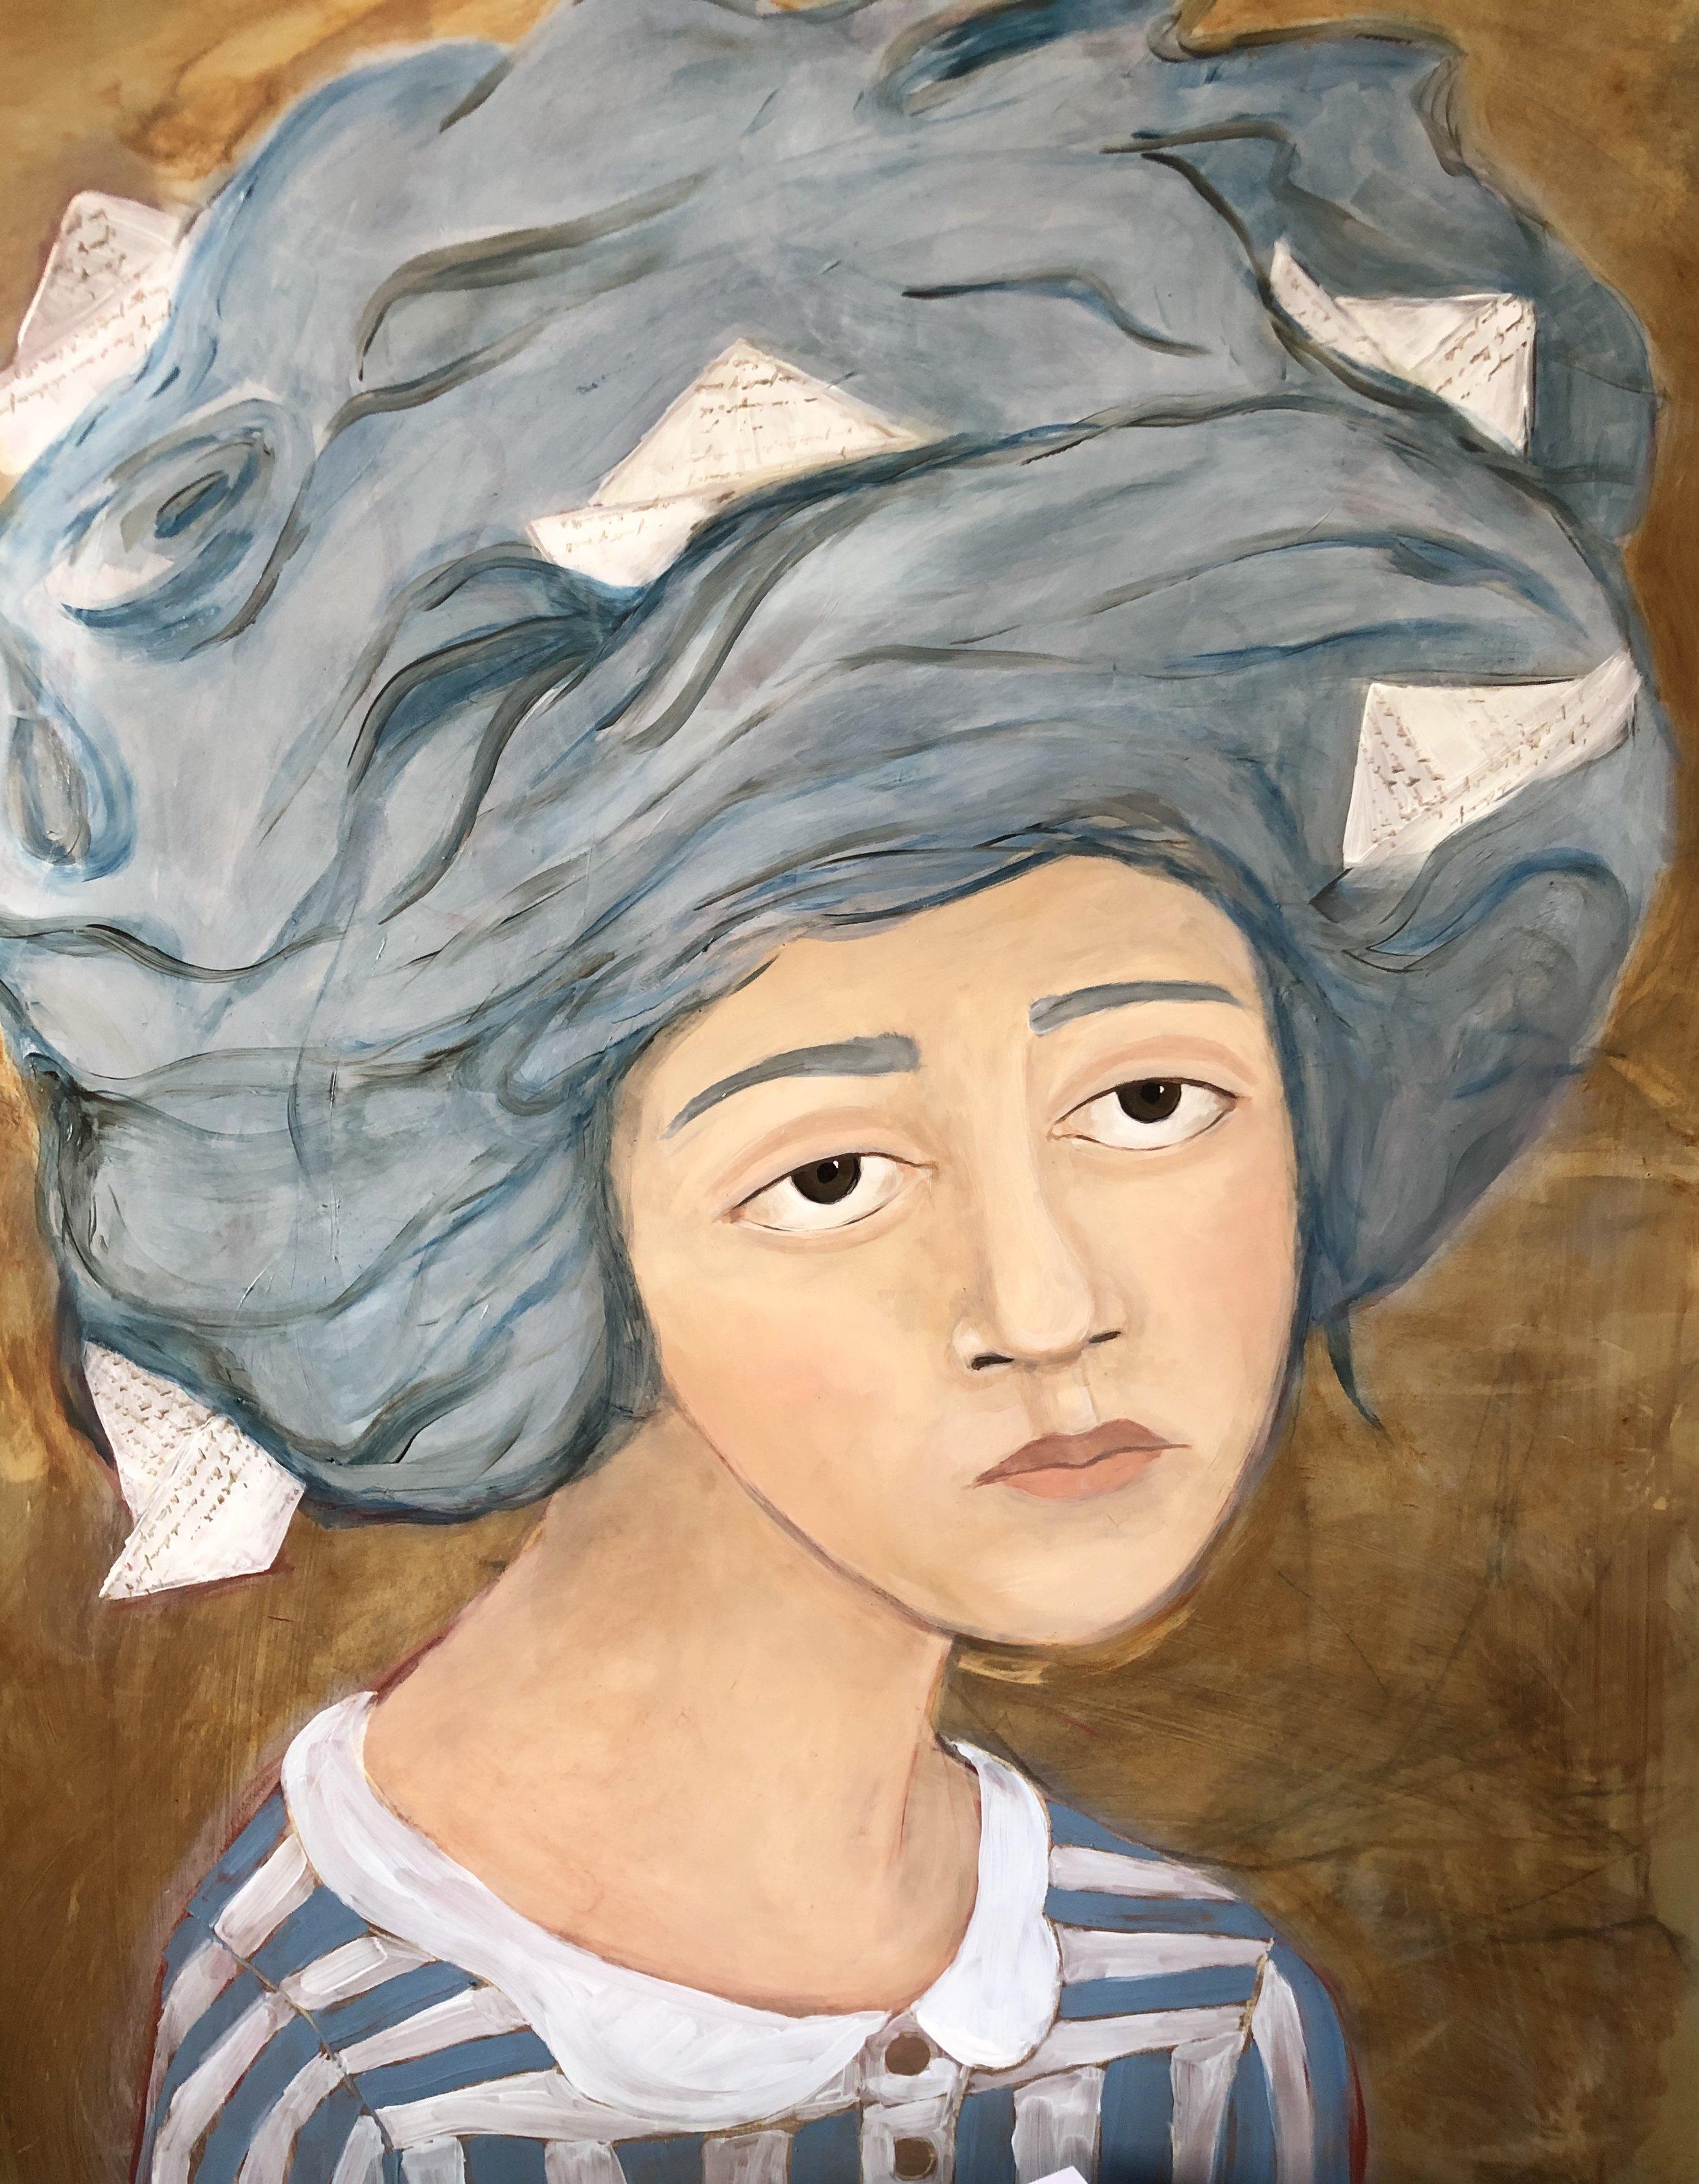 """Pirated"" by Elizabeth Sanchez. Oil on Panel."